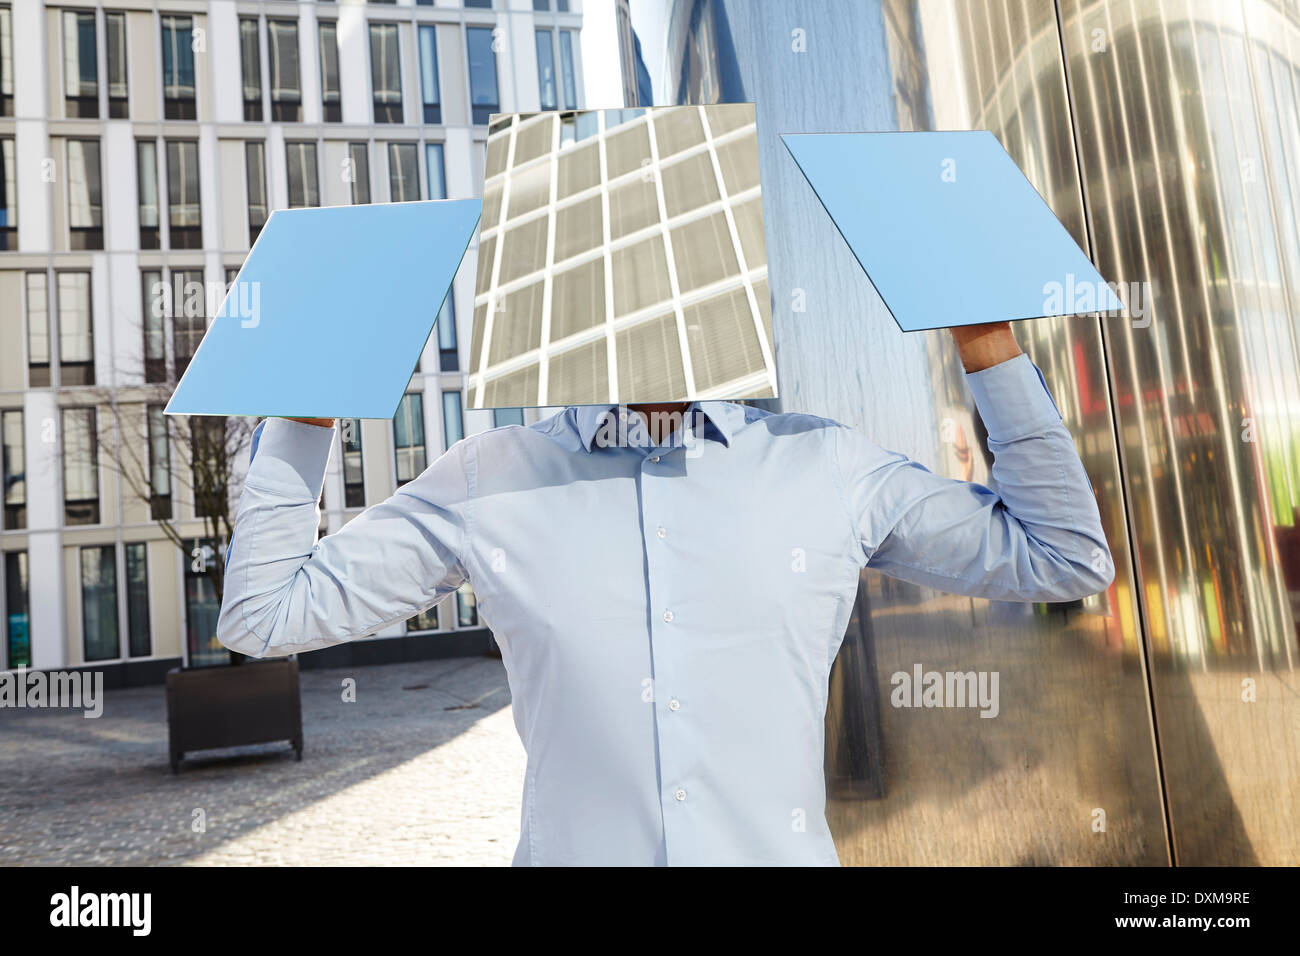 Man hidden behind rectangles - Stock Image